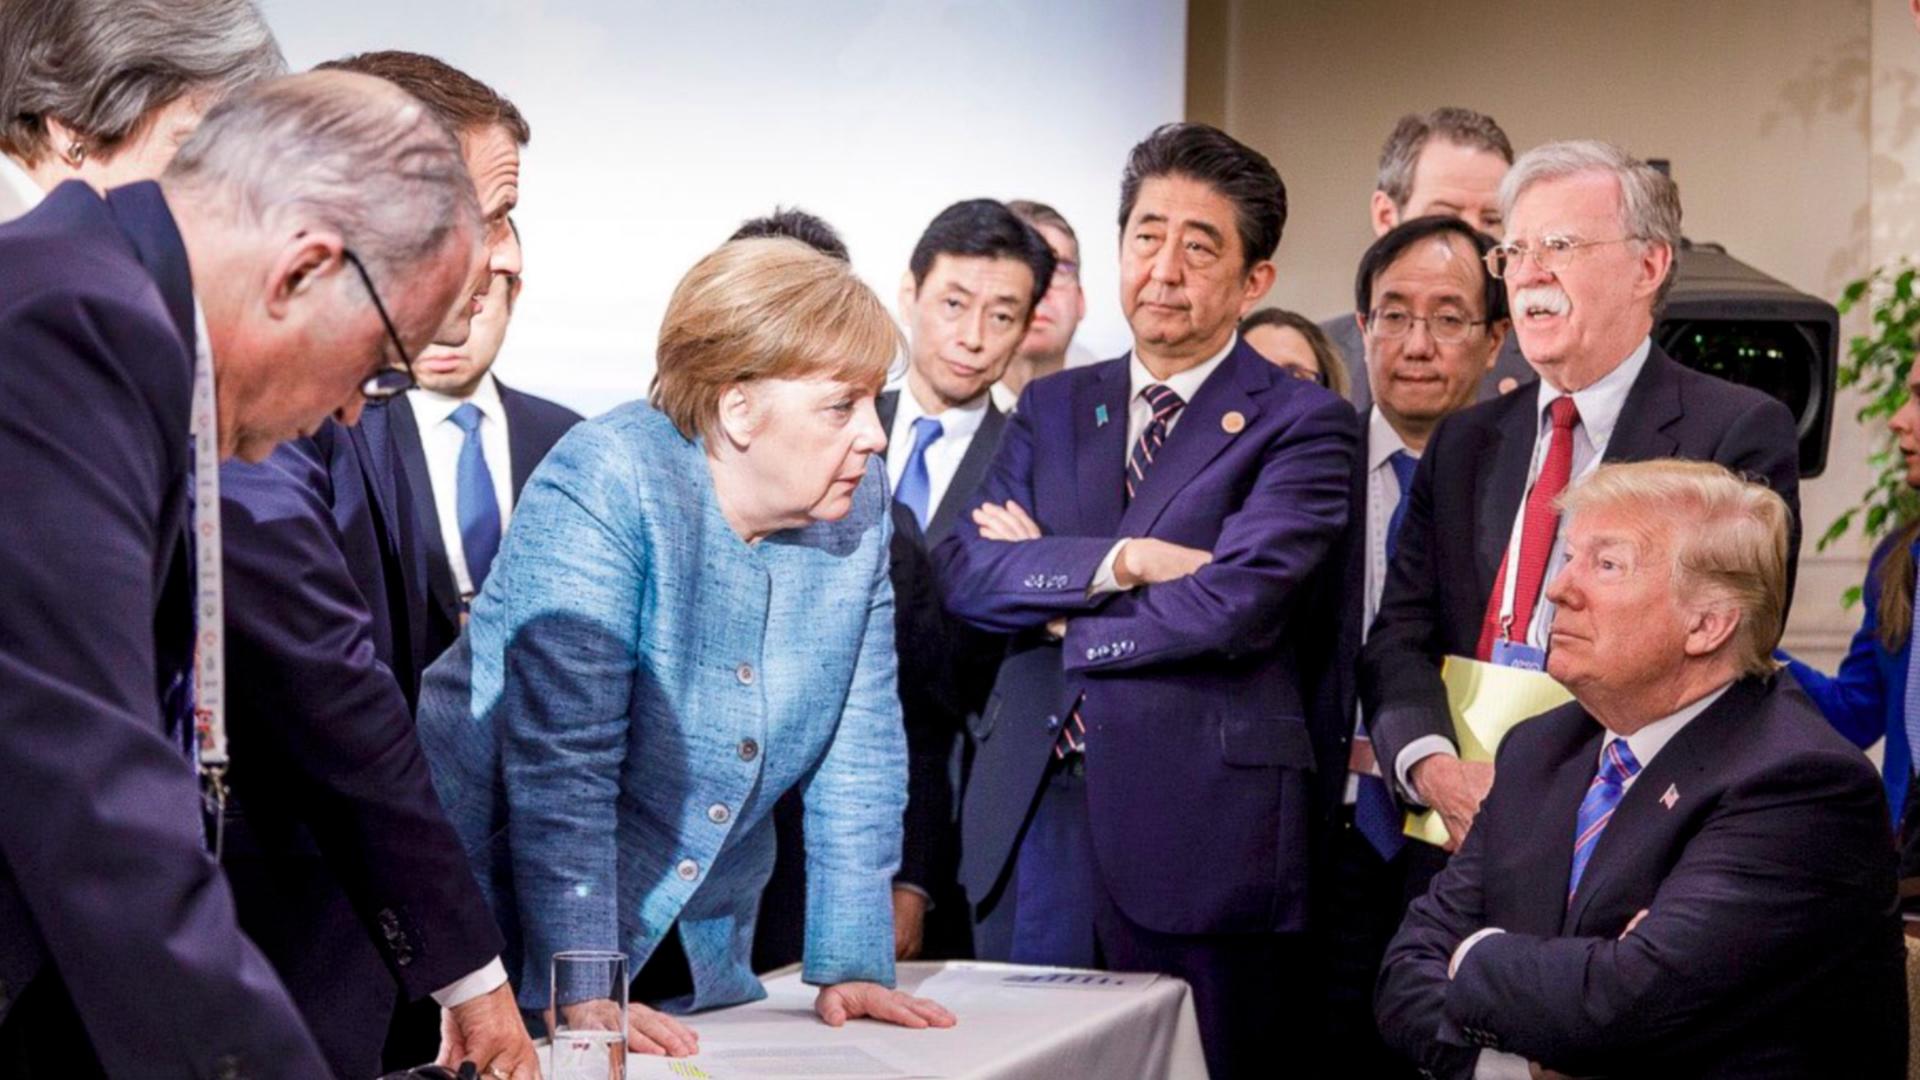 Merkel leans over a sitting Trump